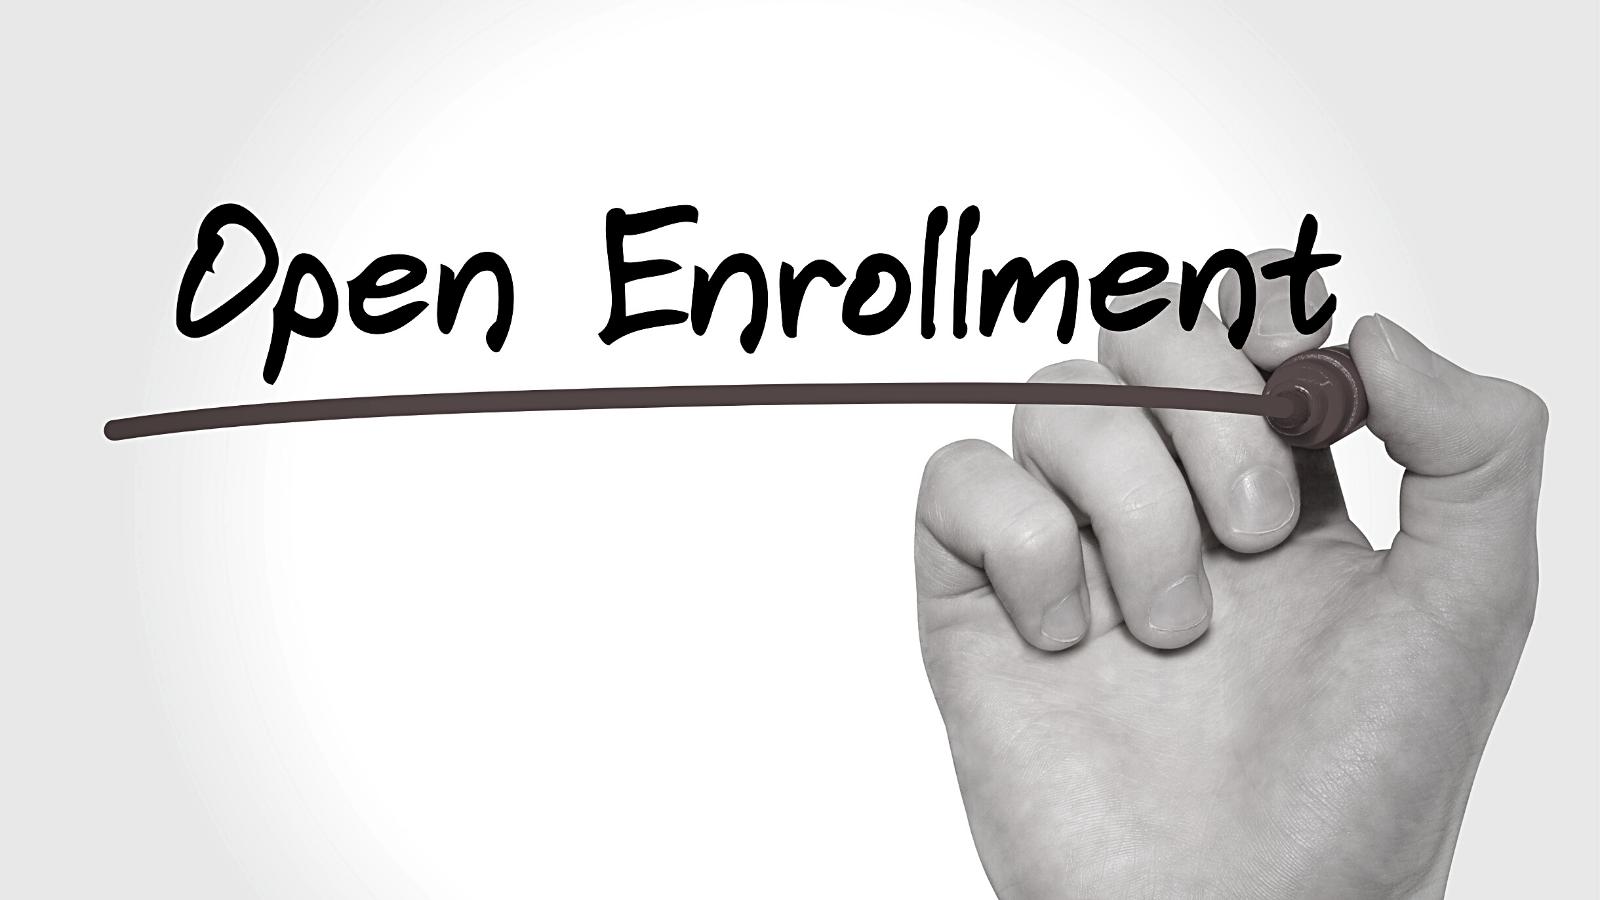 open-enrollment-text-on-white-board